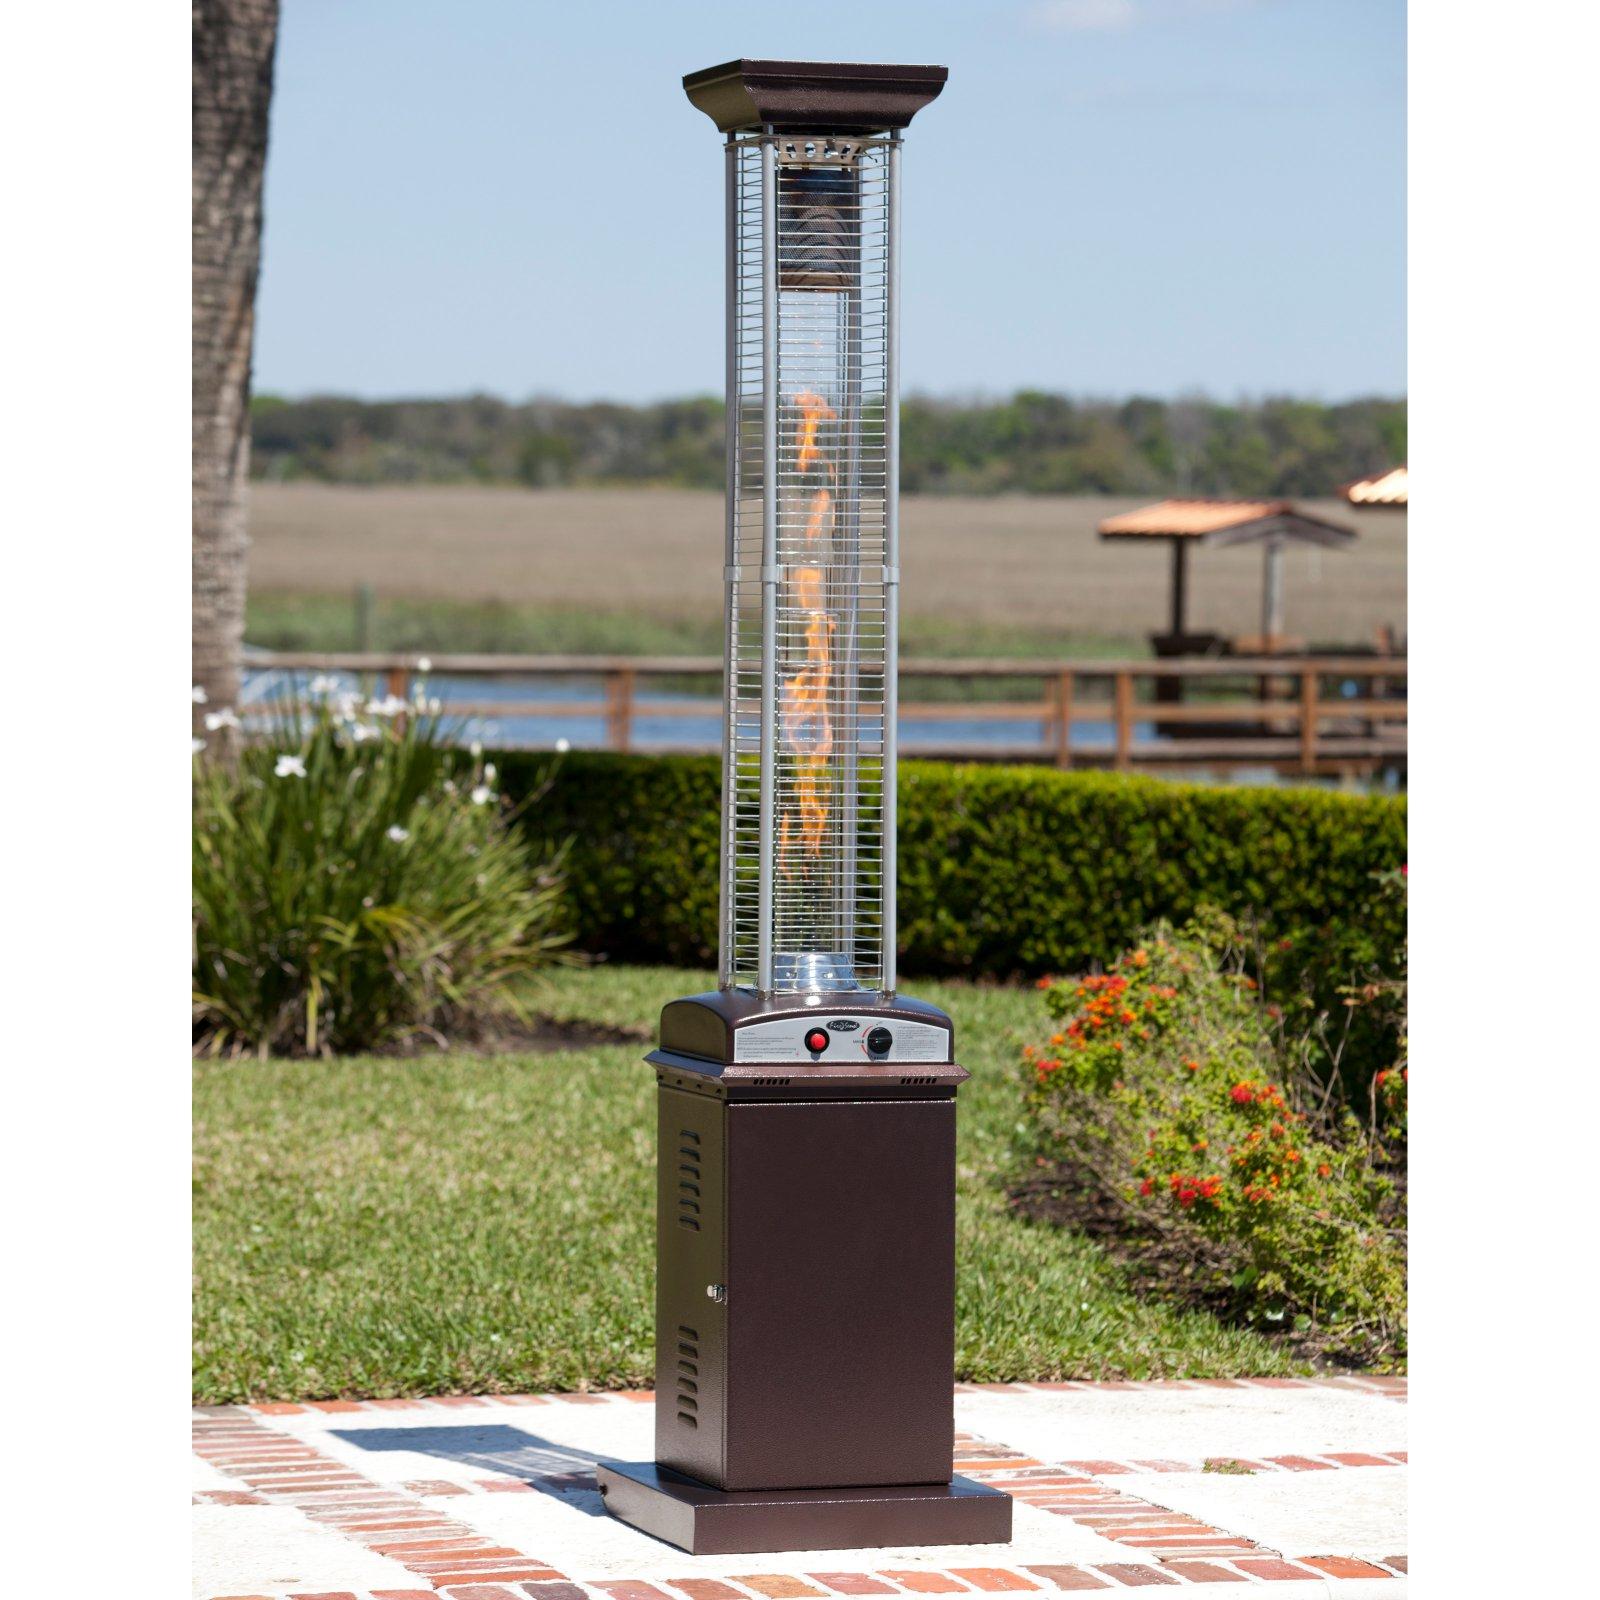 Fire Sense Square Flame Patio Heater